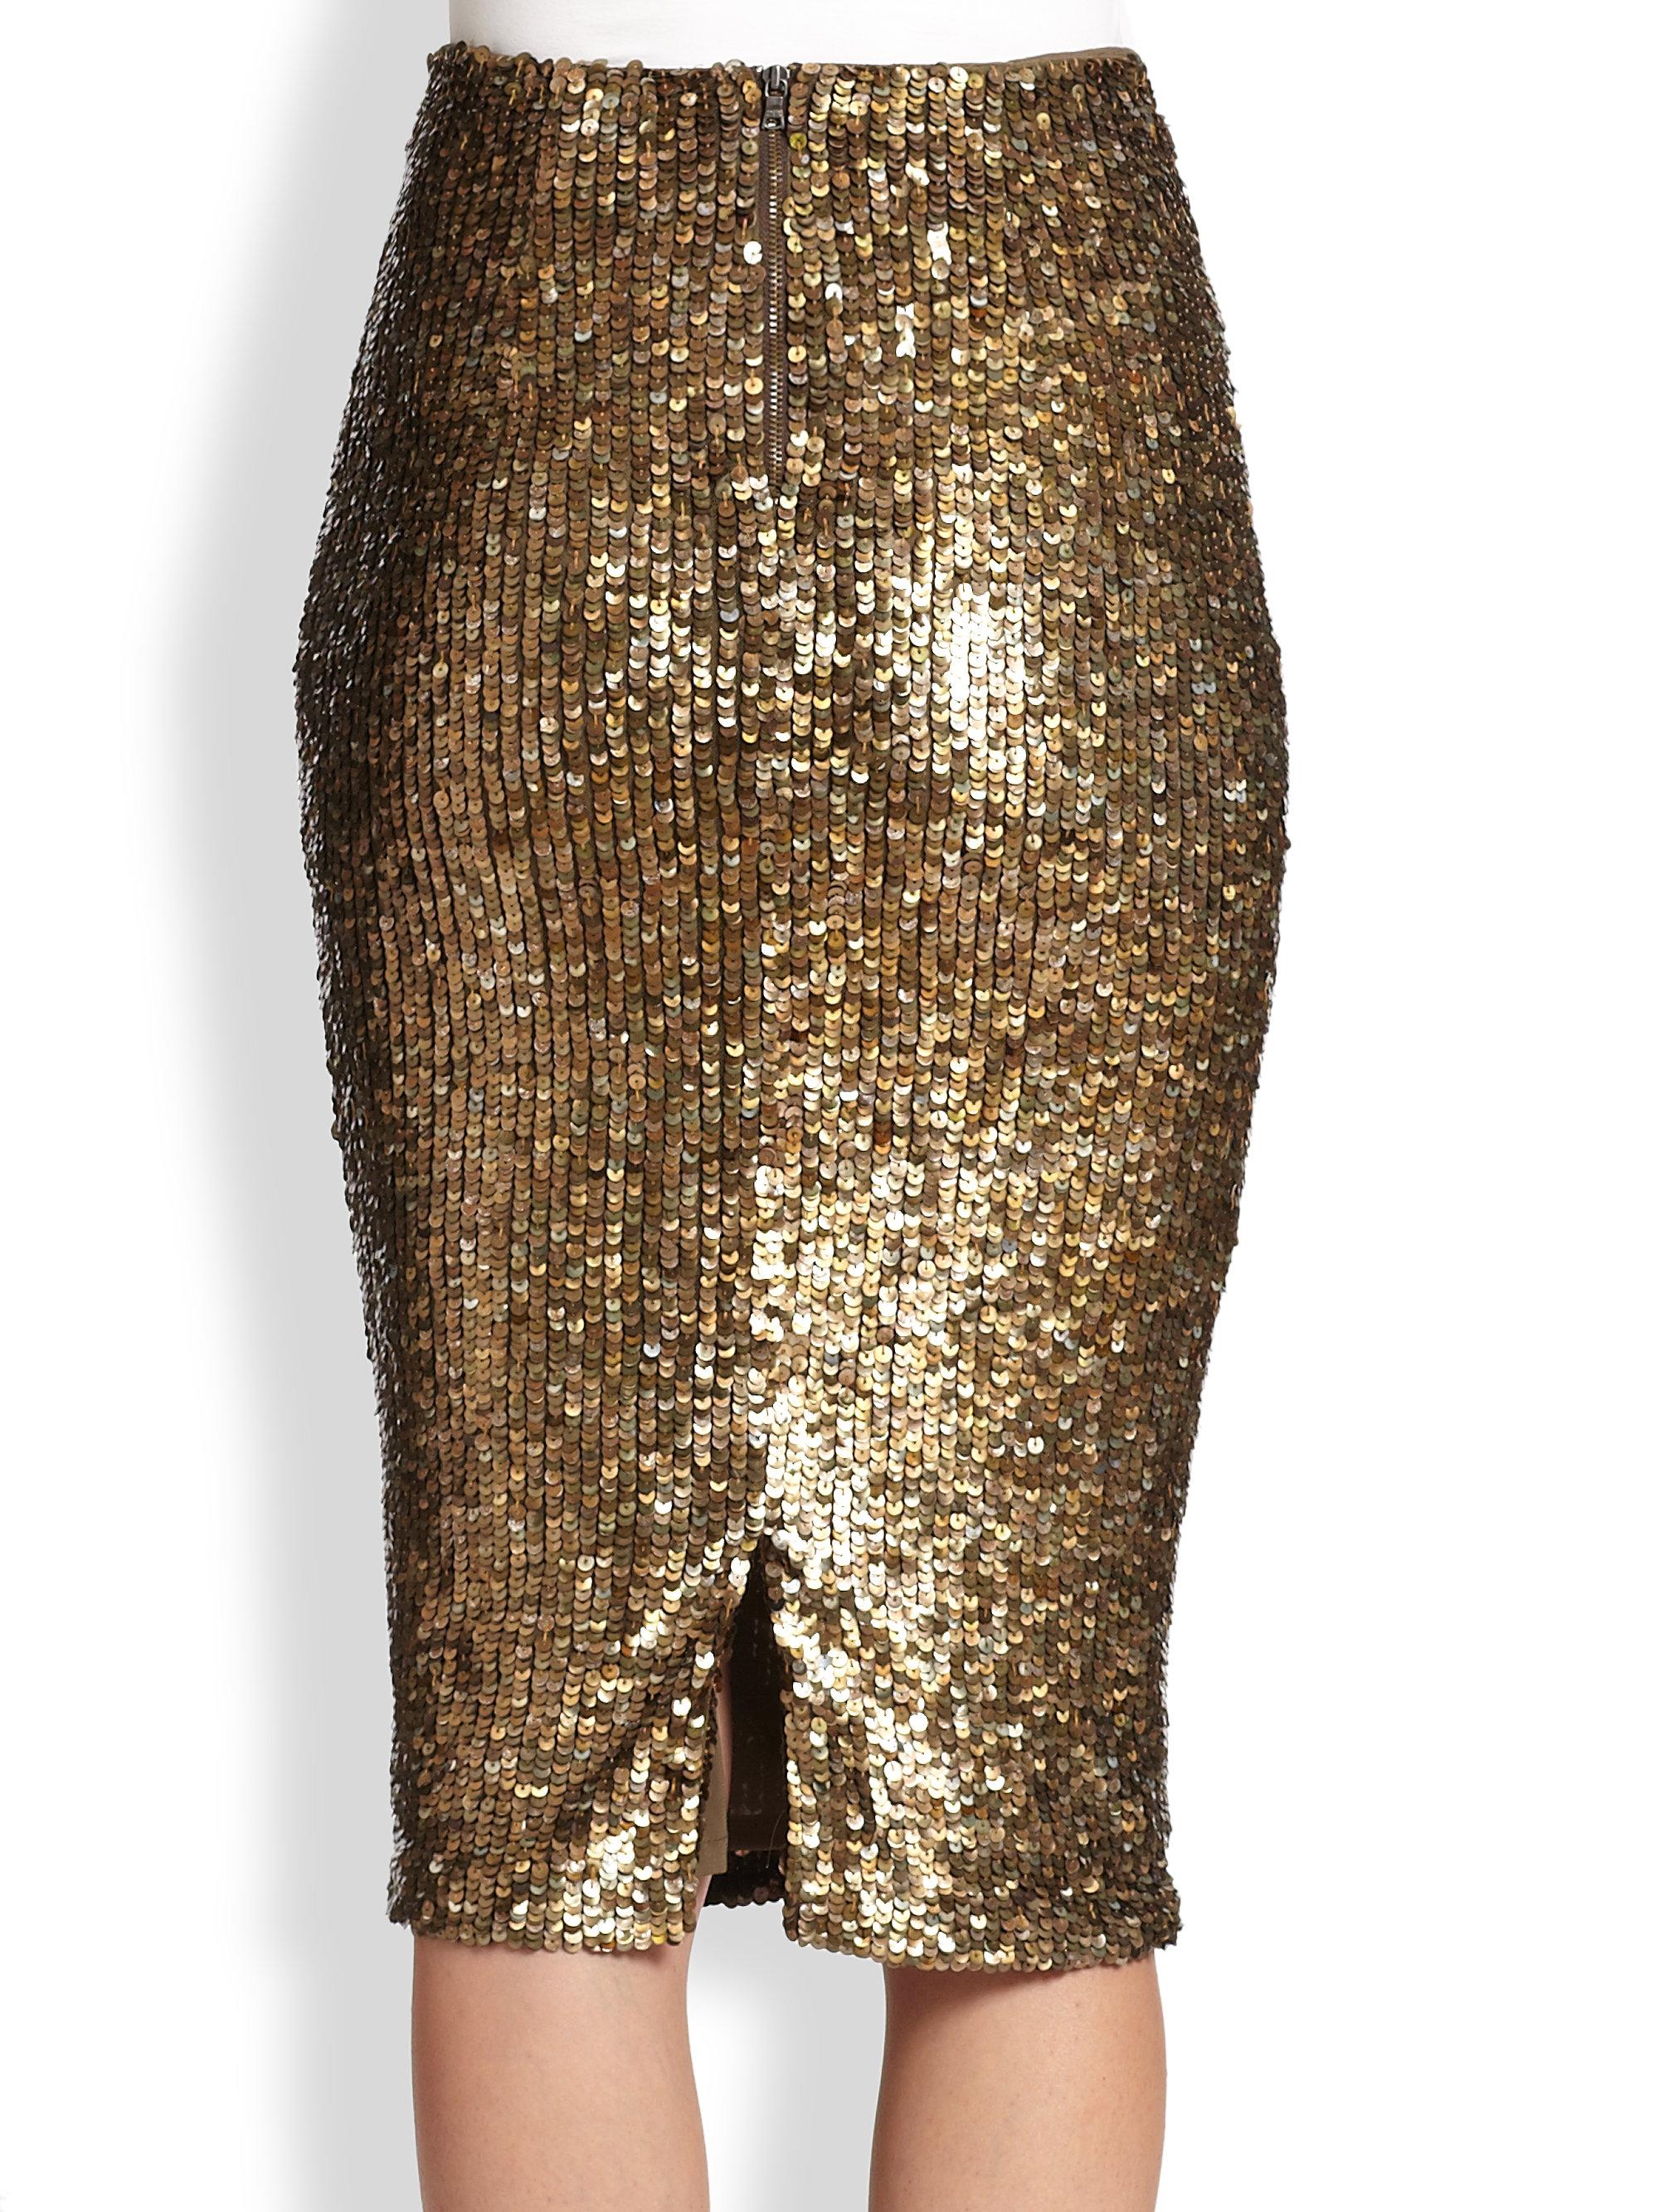 Gold Pencil Skirt - Skirts